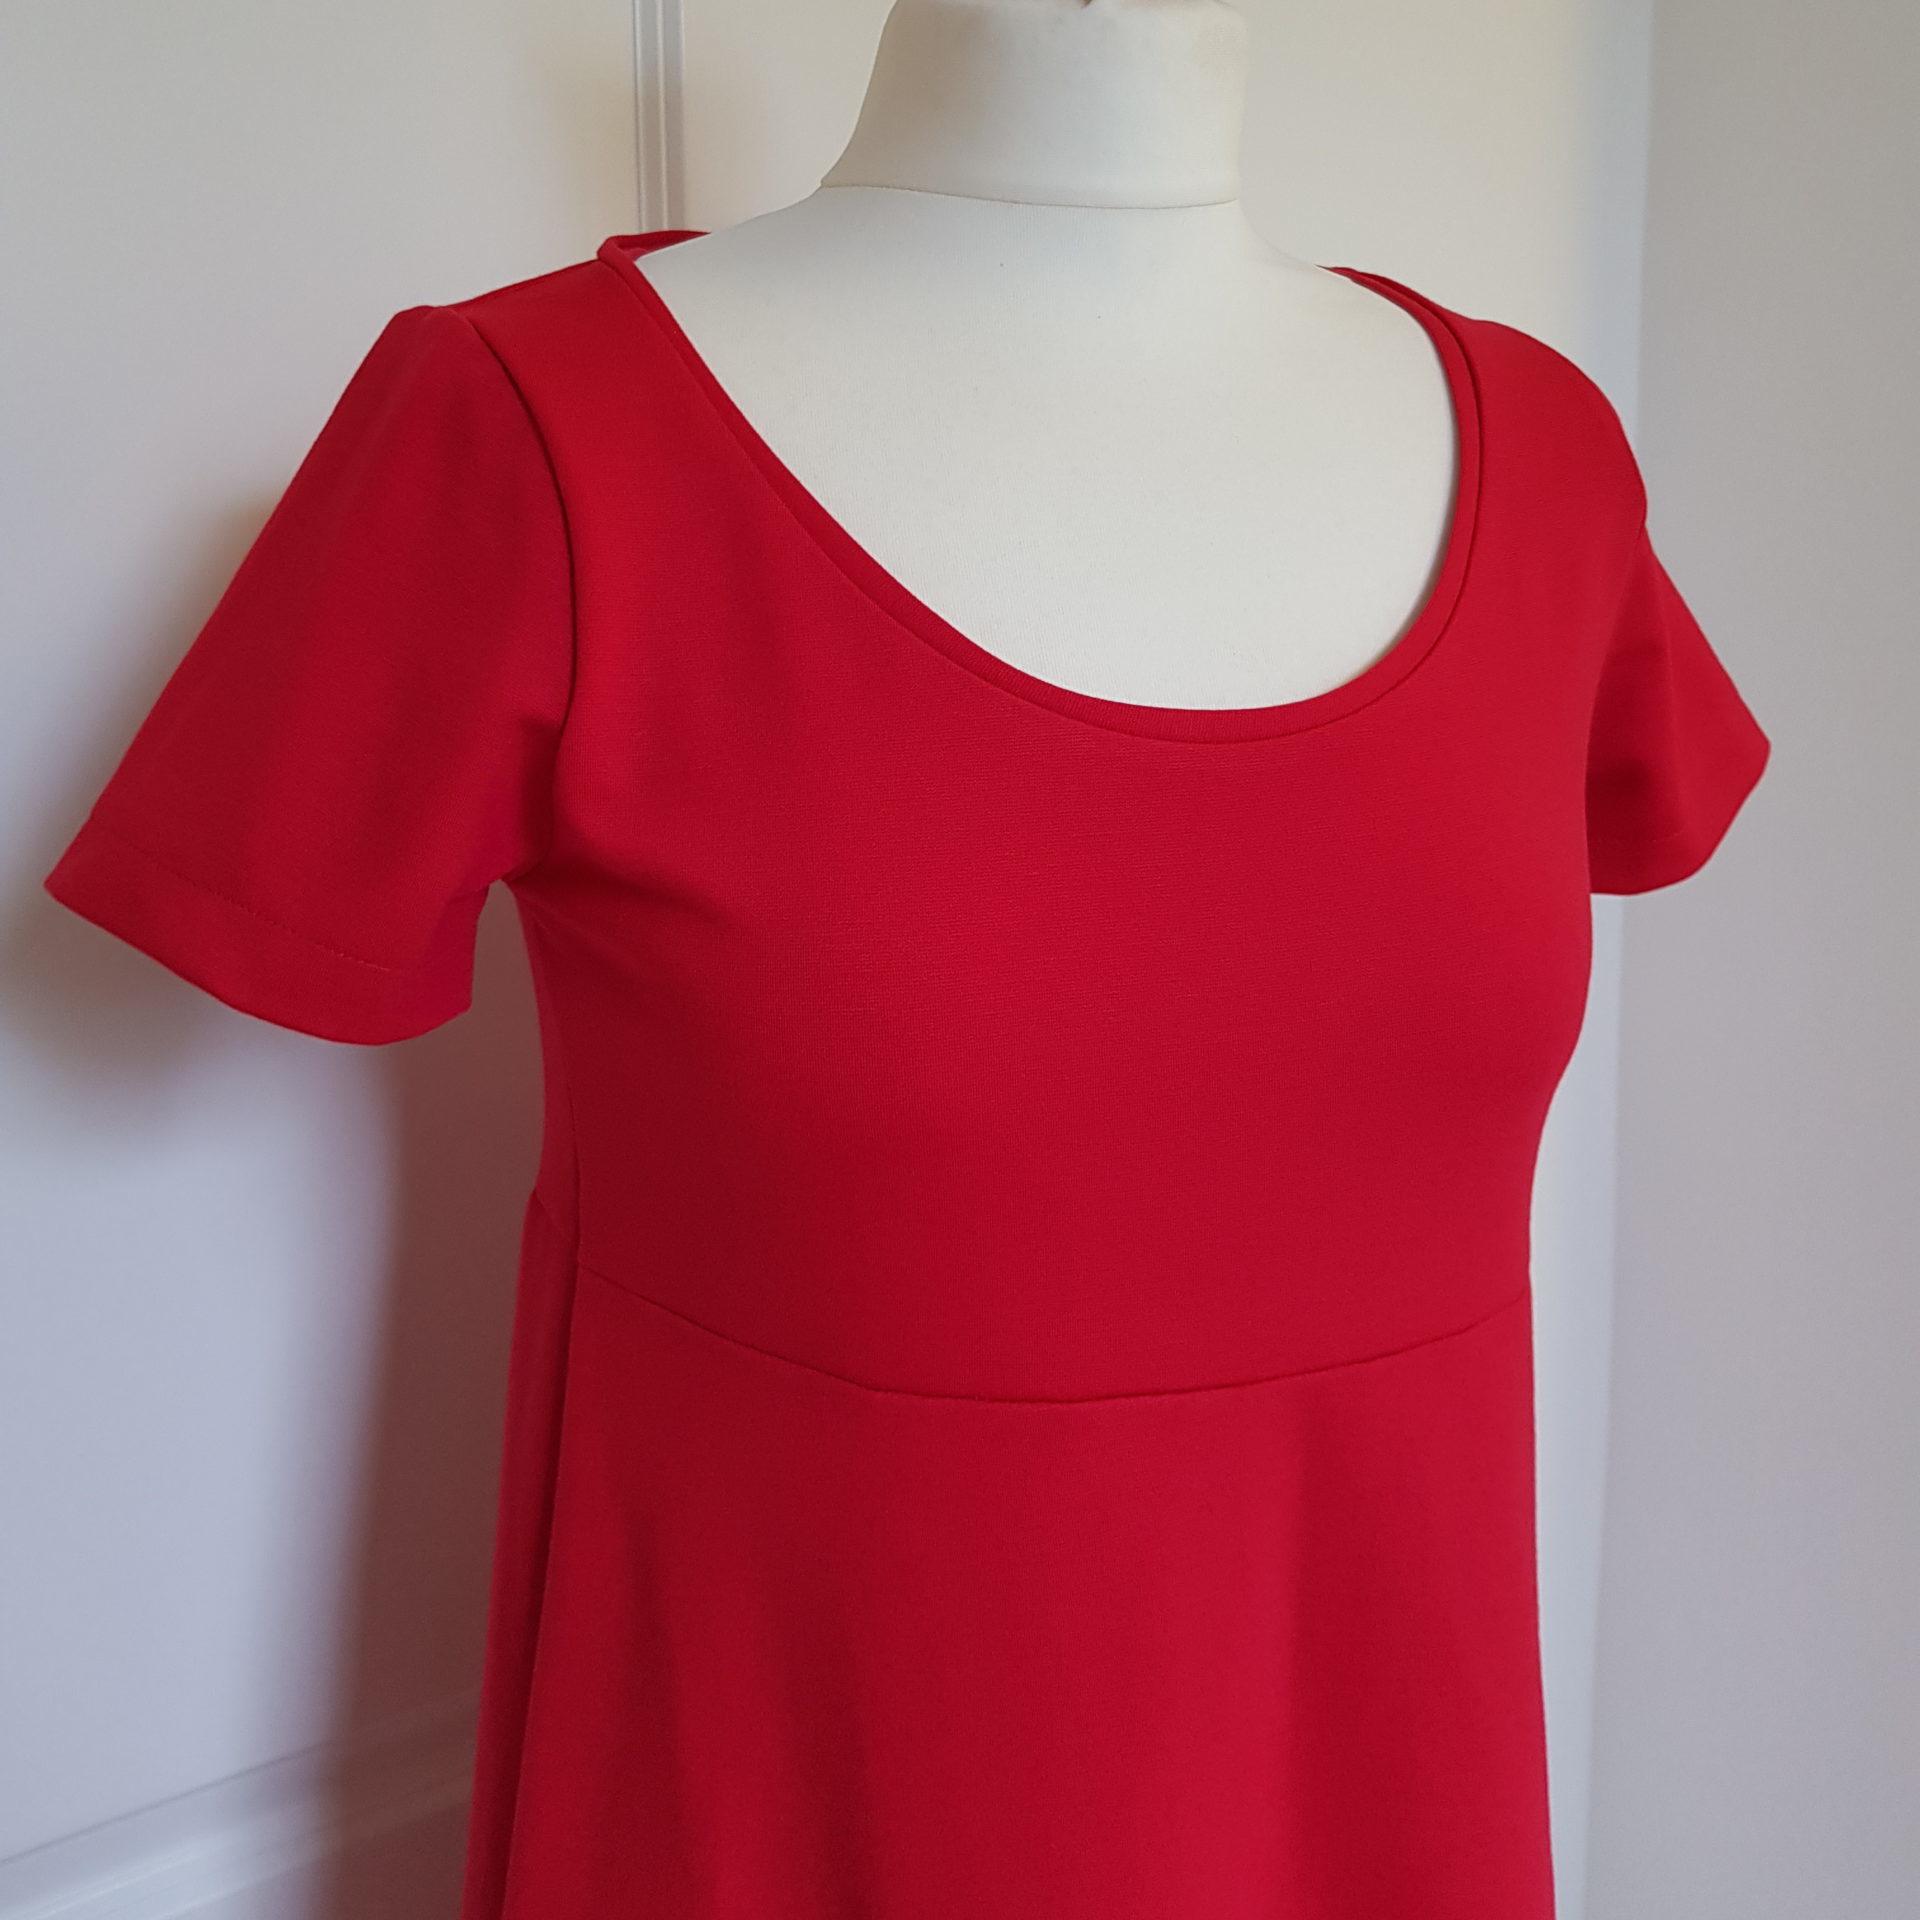 Jersey Kleid Schnittmuster kostenlos